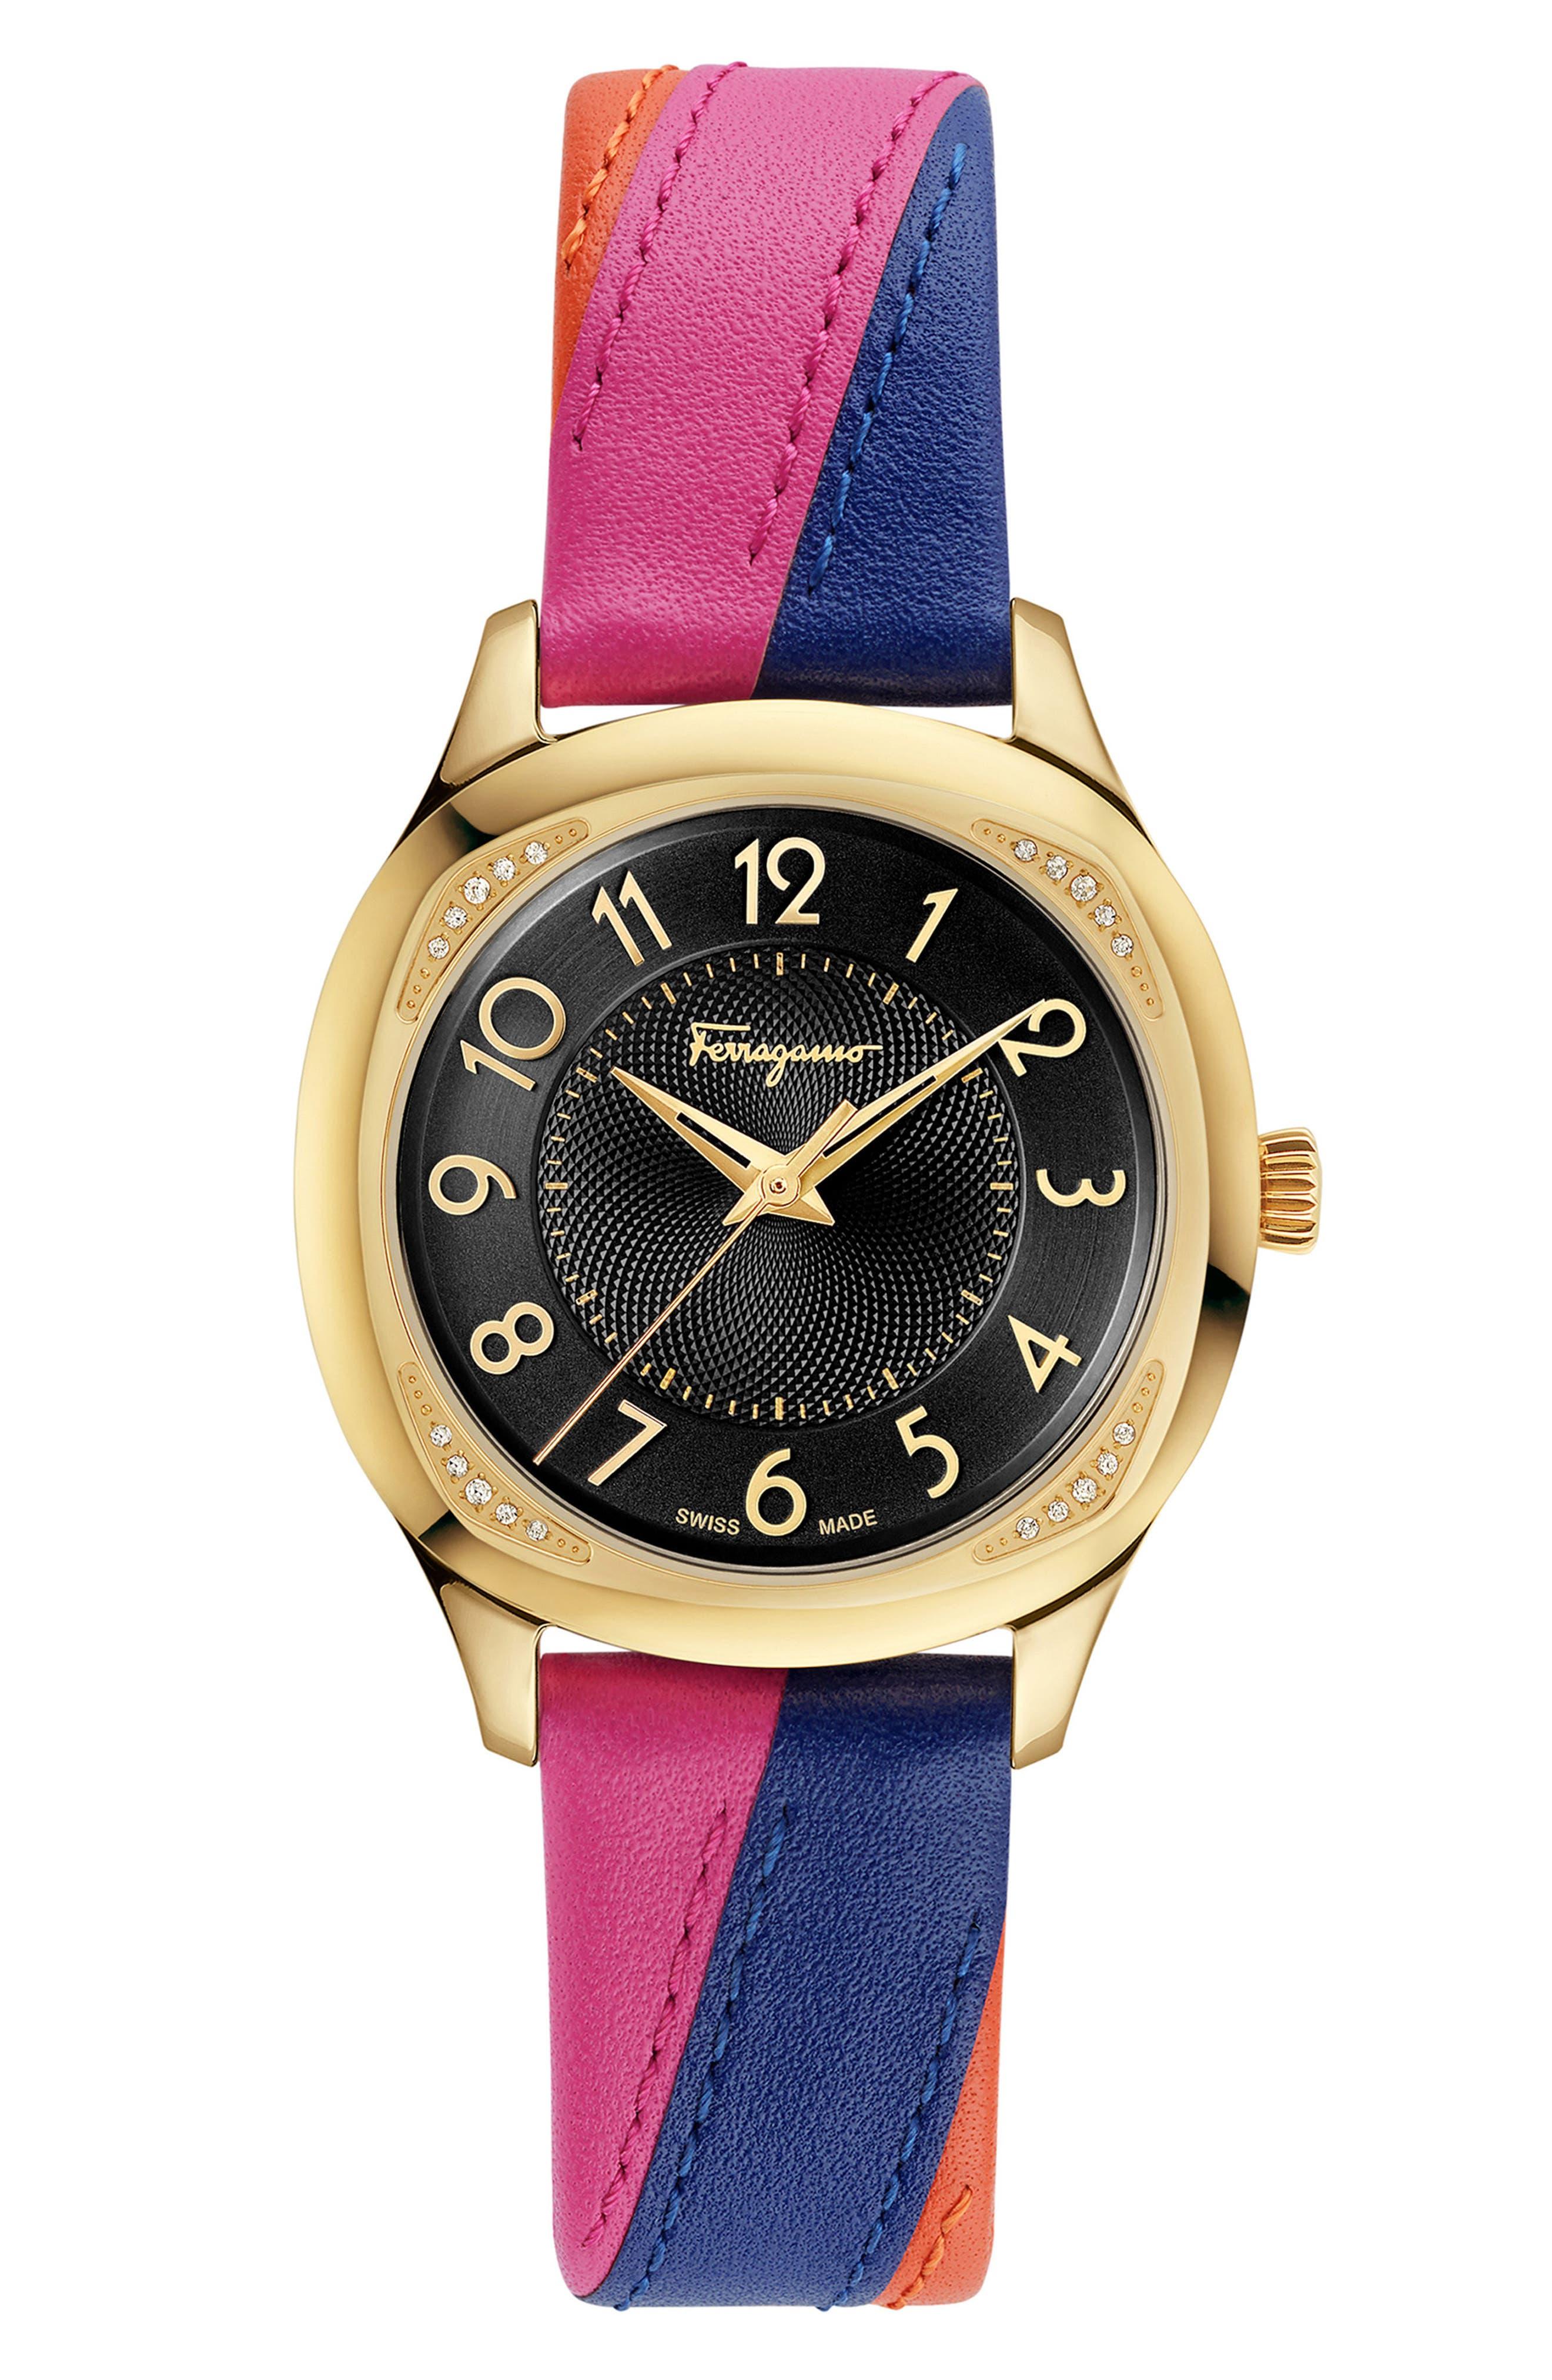 Main Image - Salvatore Ferragamo Time Square Leather Strap Watch, 36mm